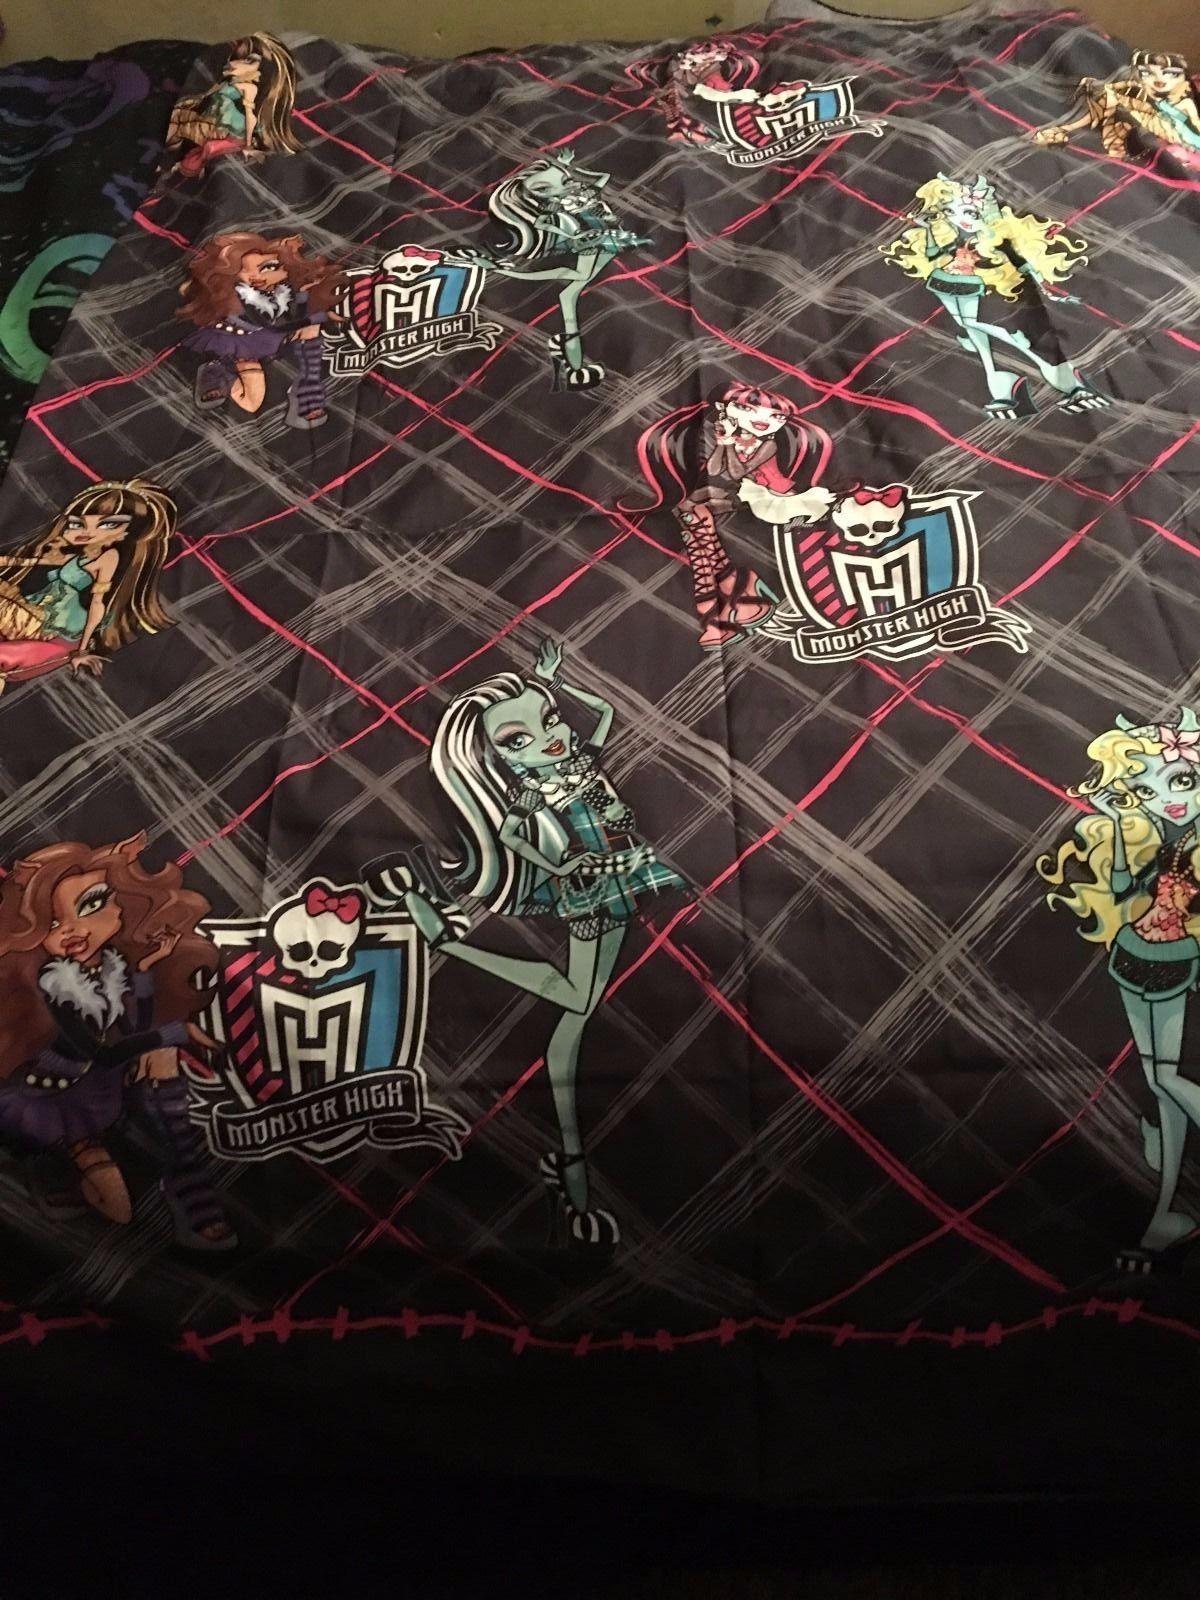 "Monster High Kids Curtain Panel Black 41"" x 63"" Window Curtain ~ Set of 2 Panels"